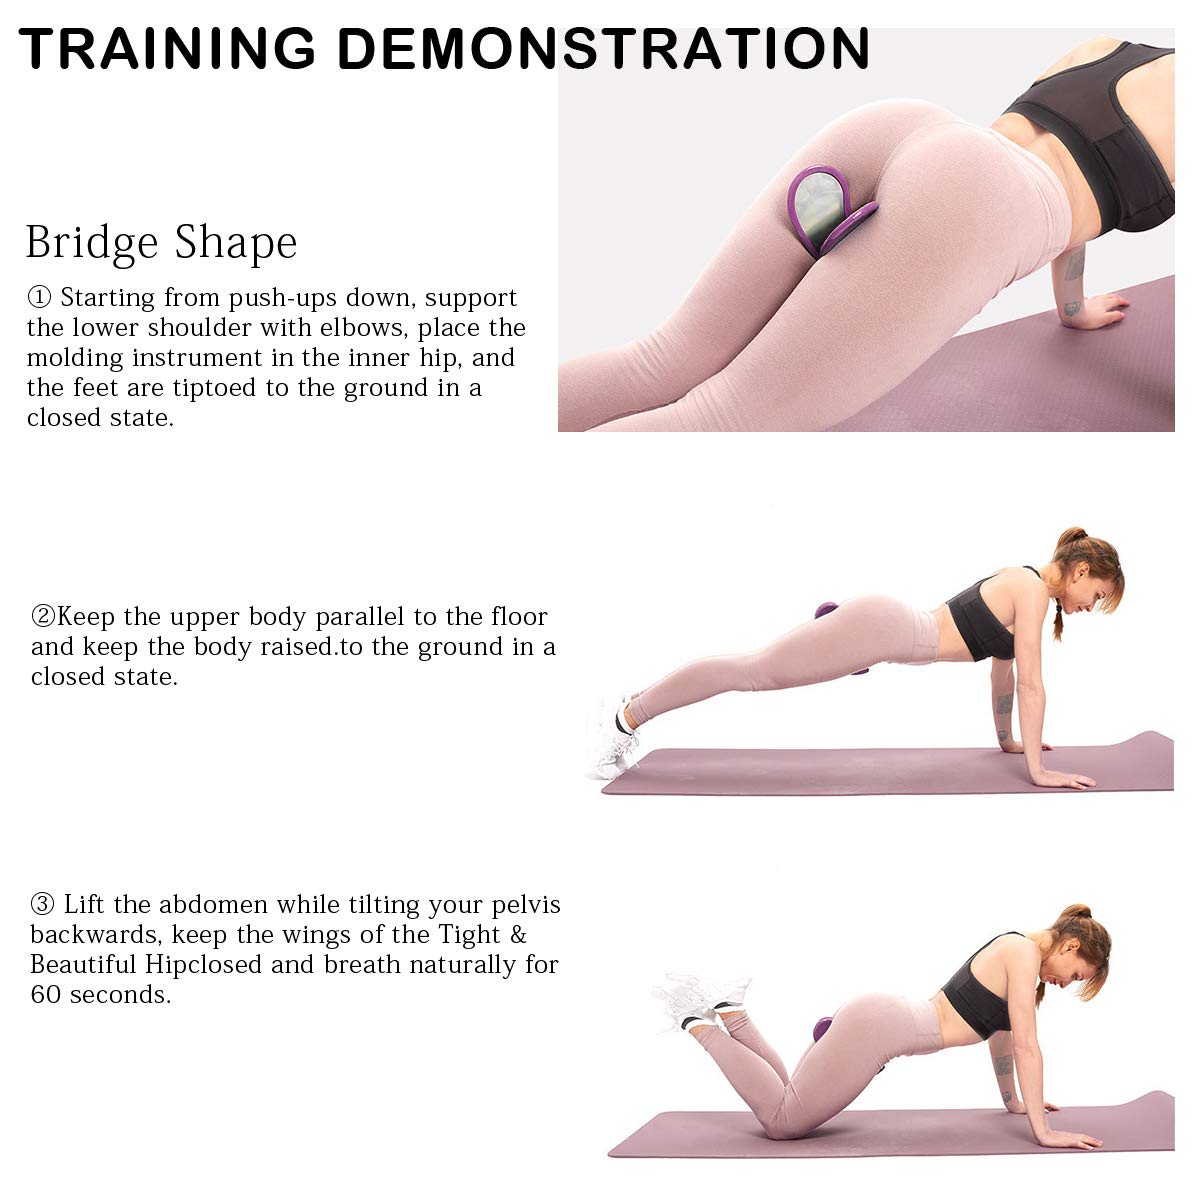 Hip Trainer /& Hip Muscle Tight Buttocks Exercise Equipment Hip Trainer,Super Kegel Exerciser Pelvic Floor Muscle Trainer and Inner Thigh Exerciser for Women